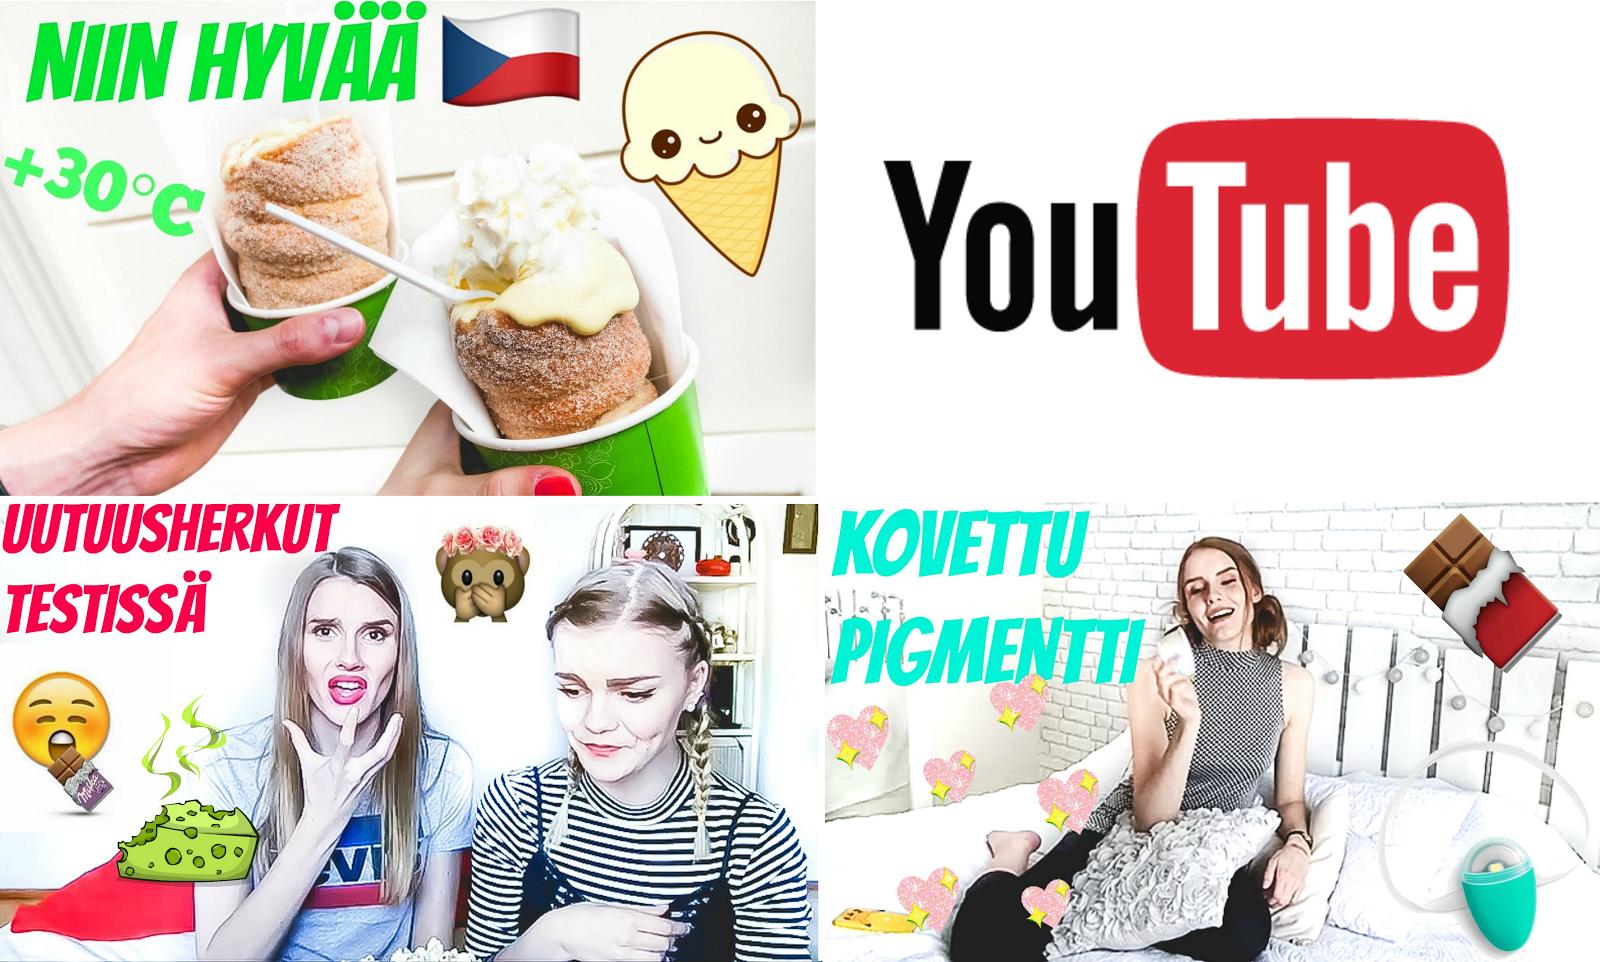 YouTube-kanava